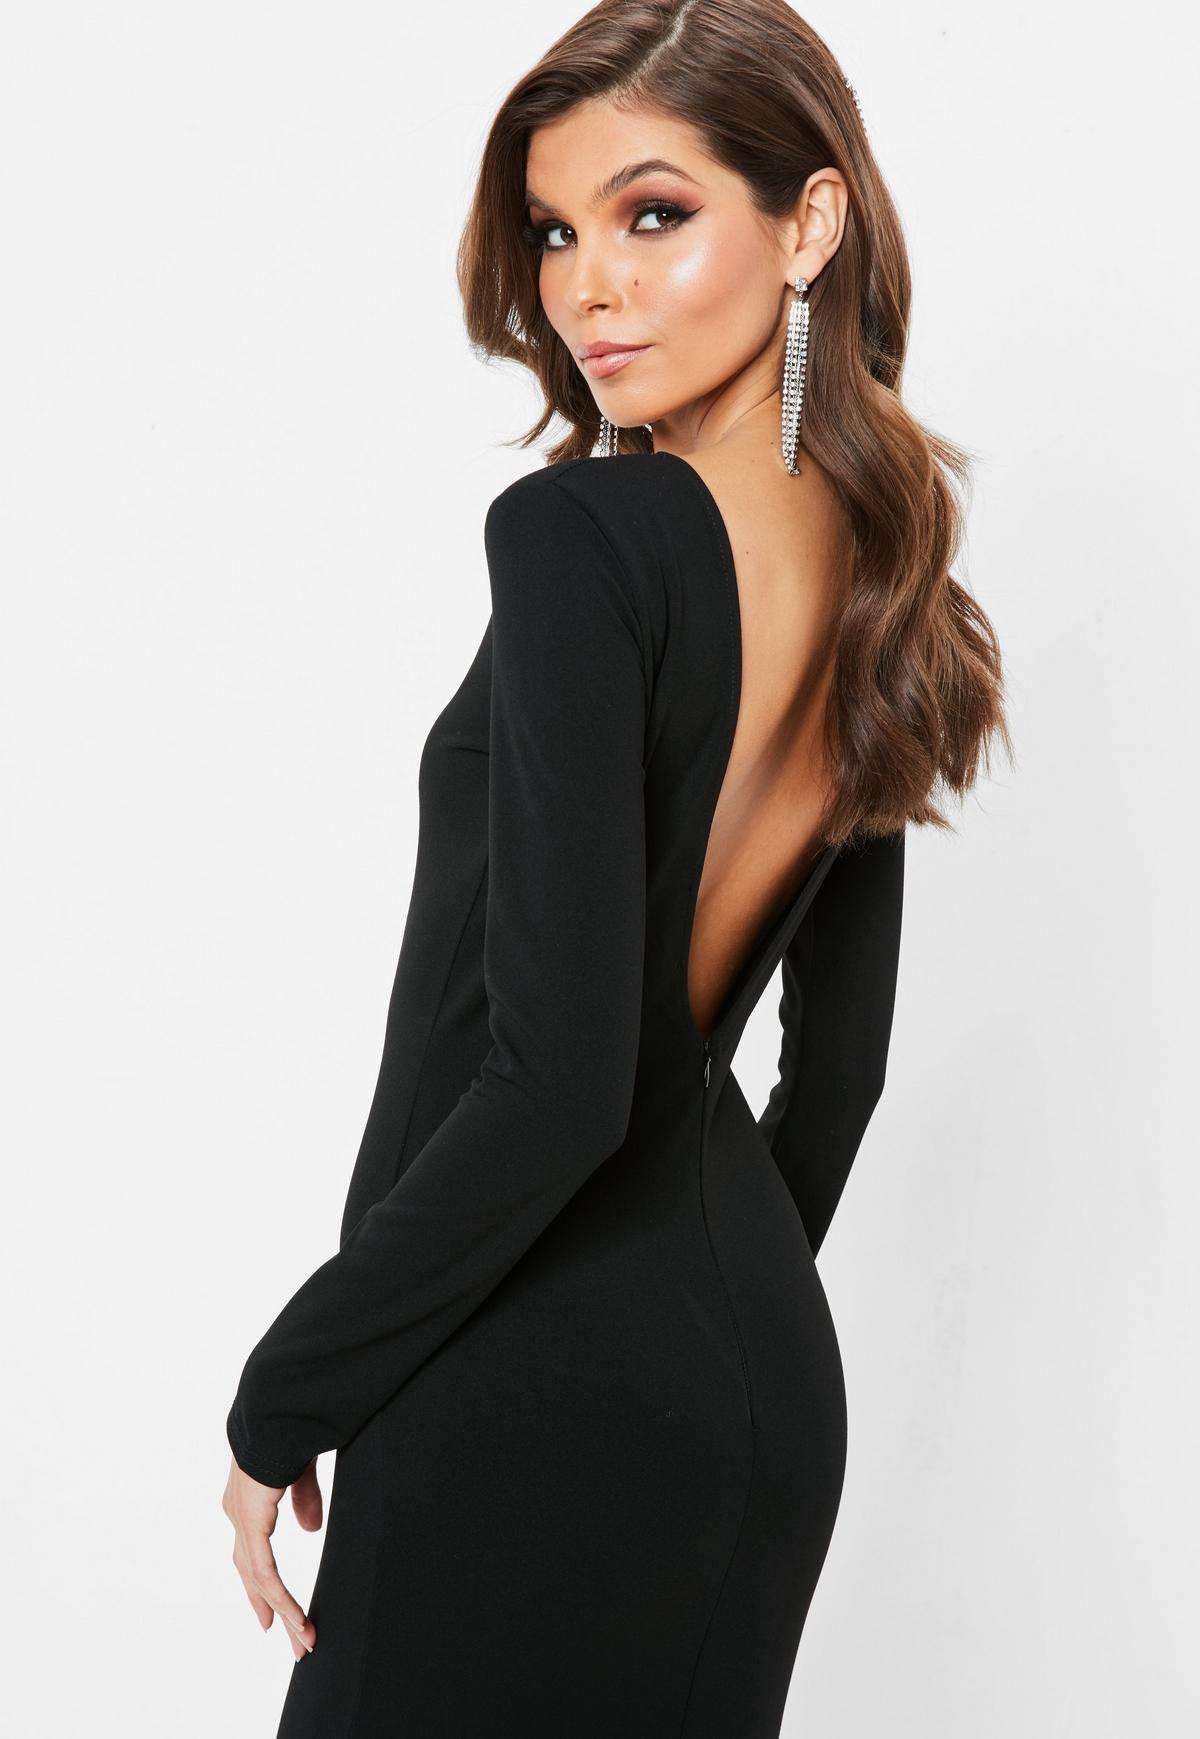 Black Open Back Maxi Dress Missguided Black Dresses Classy Elegant Backless Dress Black Tie Wedding Guest Dress [ 1739 x 1200 Pixel ]